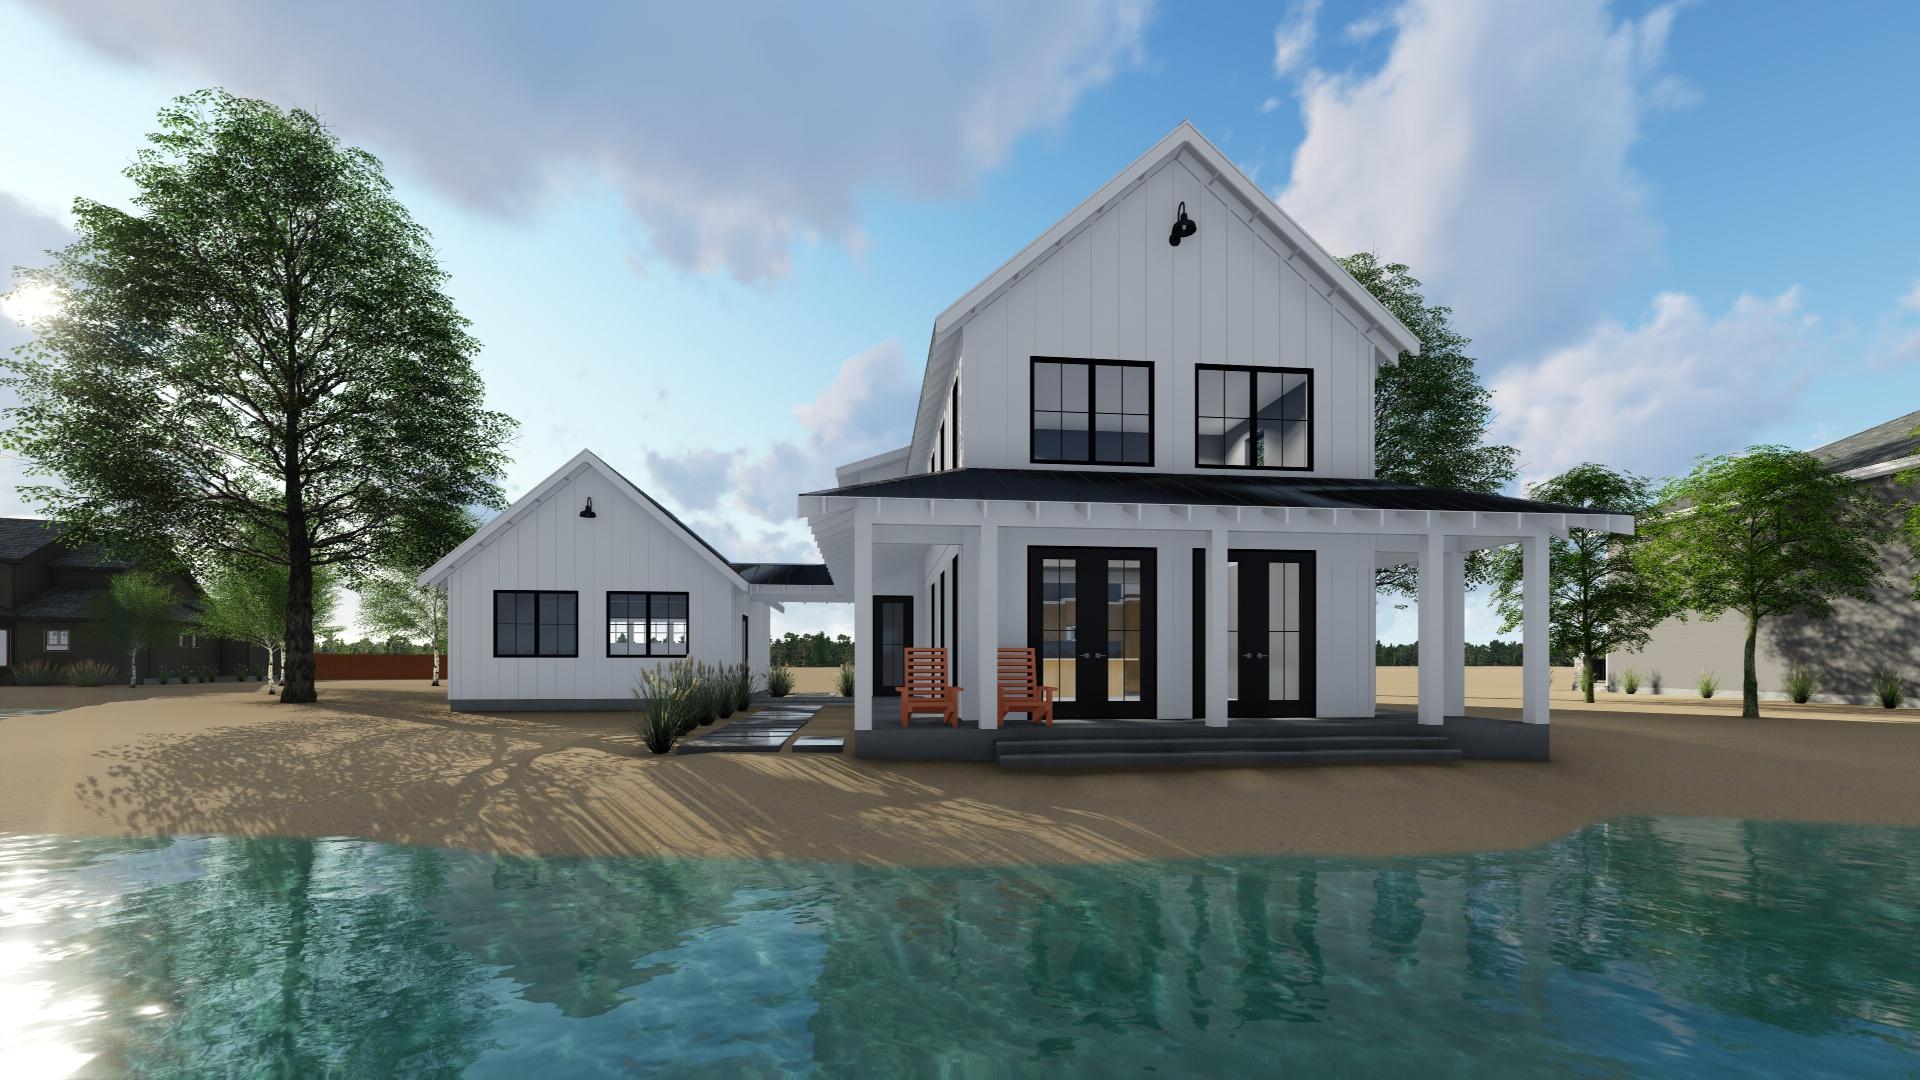 Farmhouse House Plan #100-1211: 2 Bedrm, 1757 Sq Ft Home